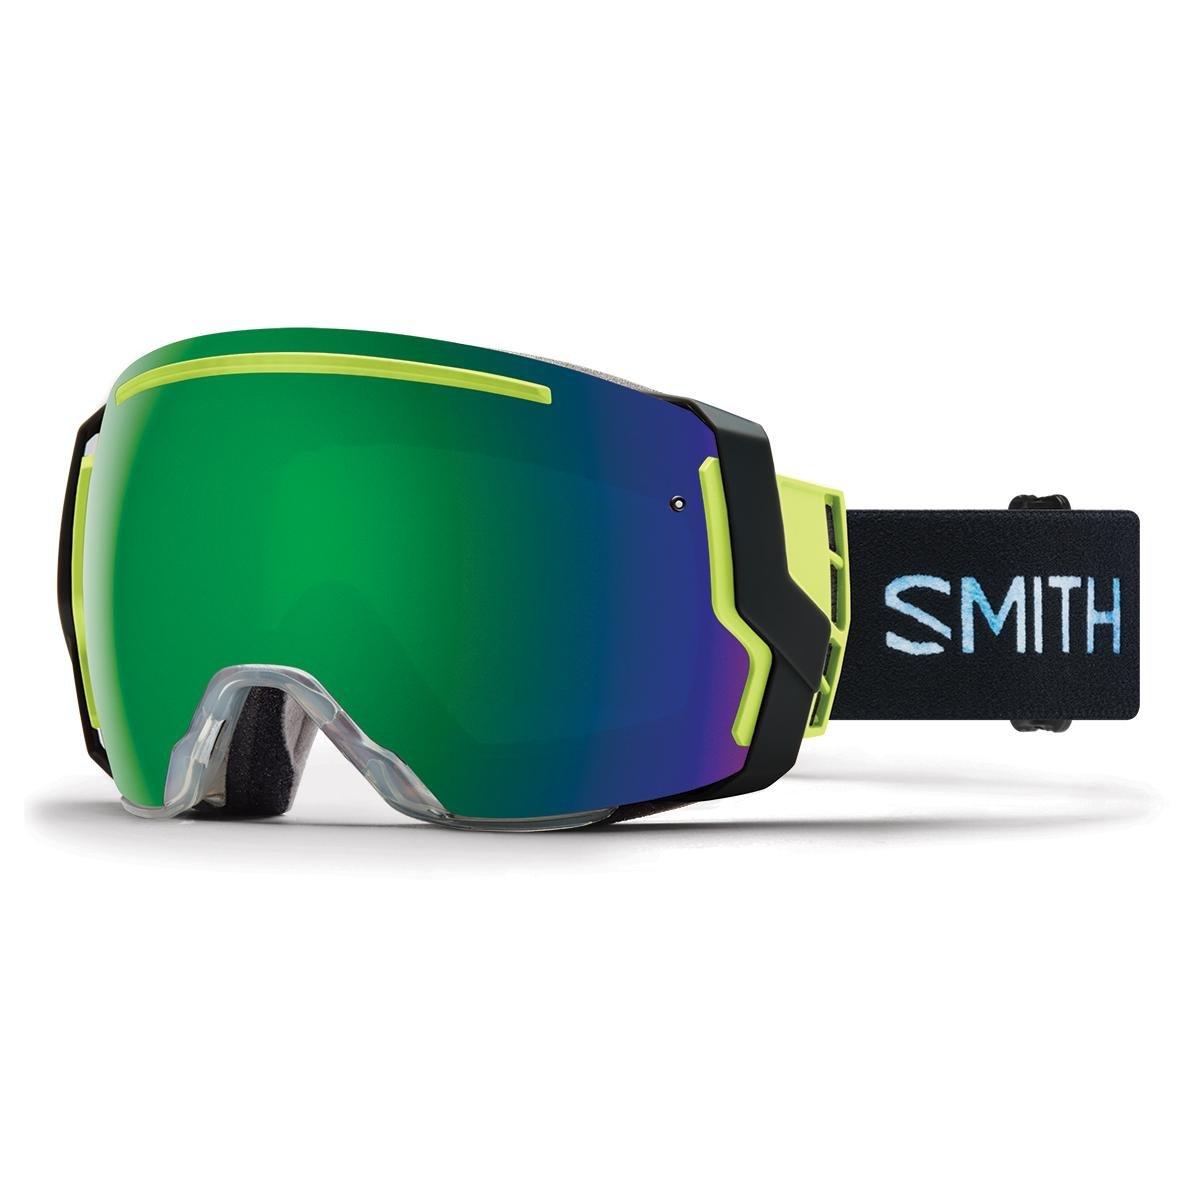 Smith Optics Adult I/O 7 Snowmobile Goggles Squall / ChromaPop Sun Green Mirror